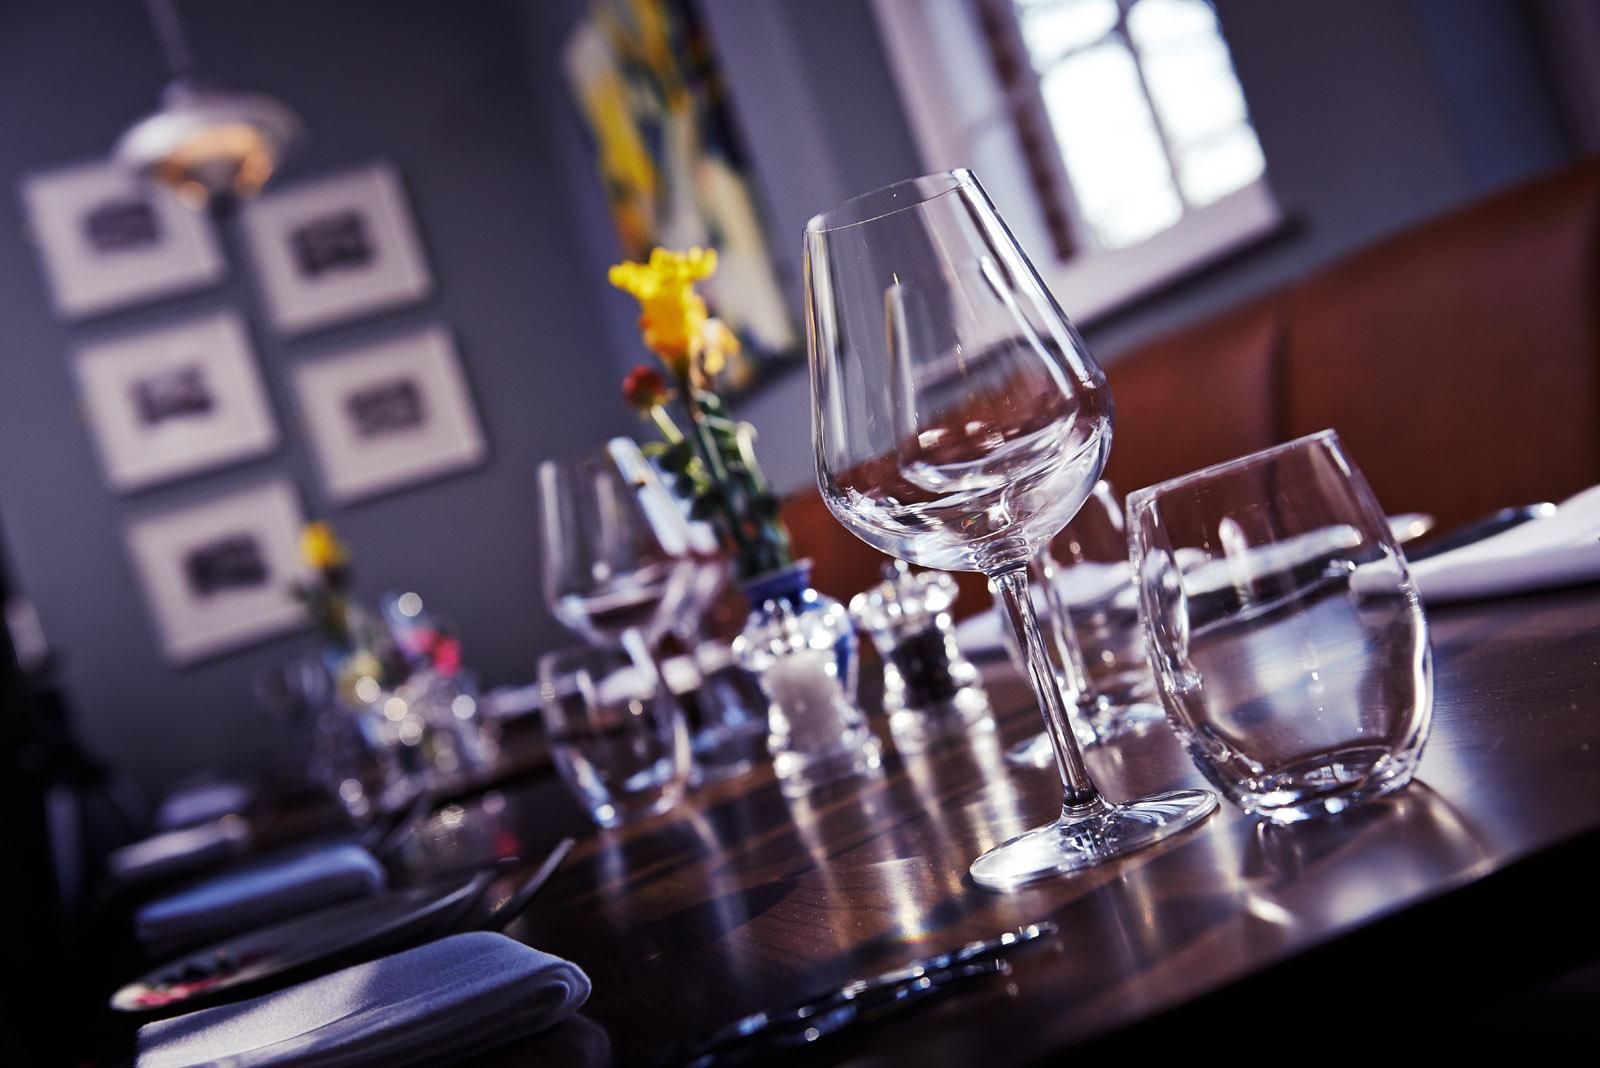 Church Street Tavern table setting